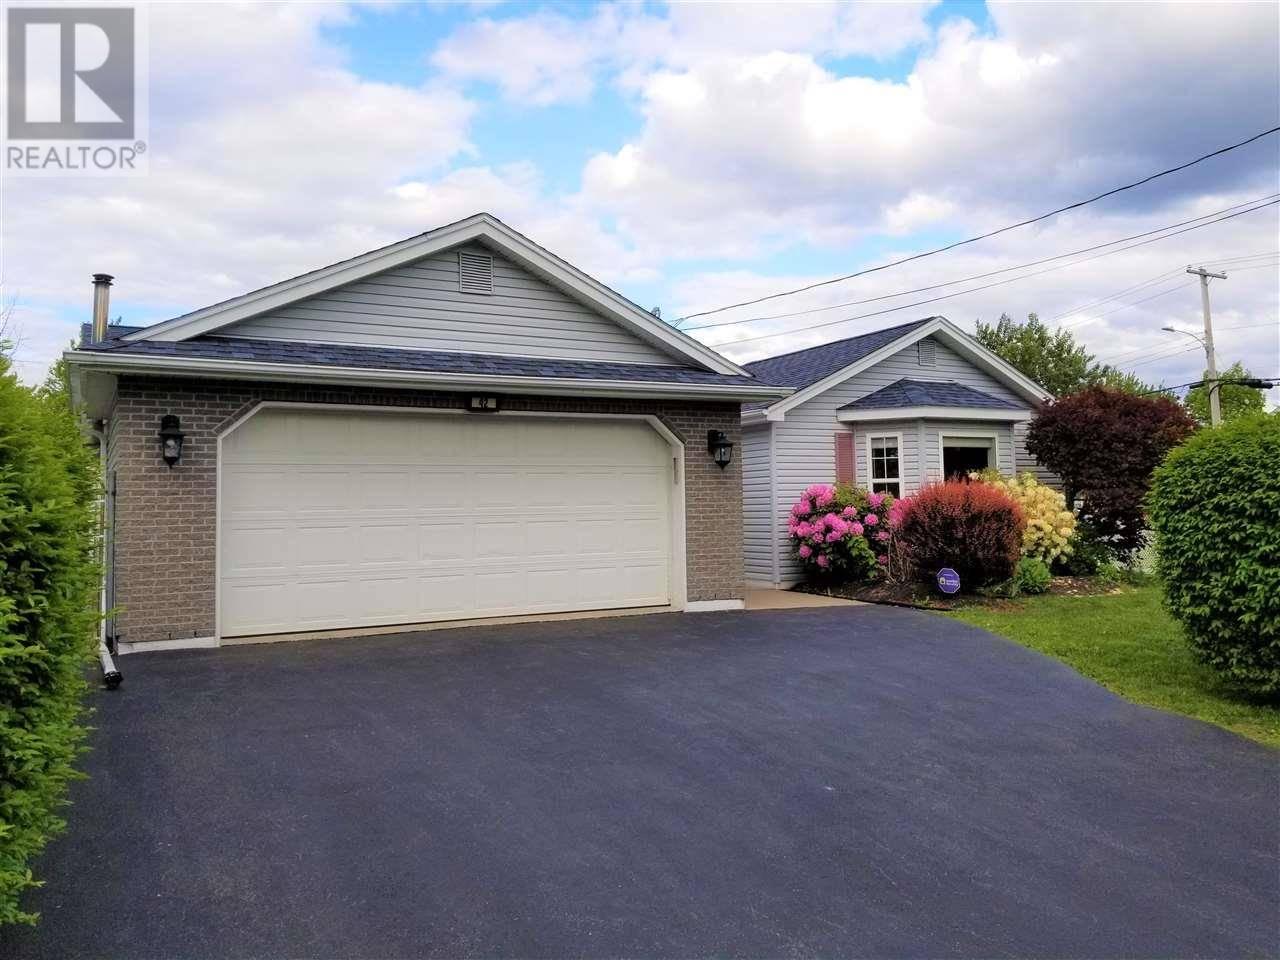 House for sale at 42 Lancaster Dr Dartmouth Nova Scotia - MLS: 201915123